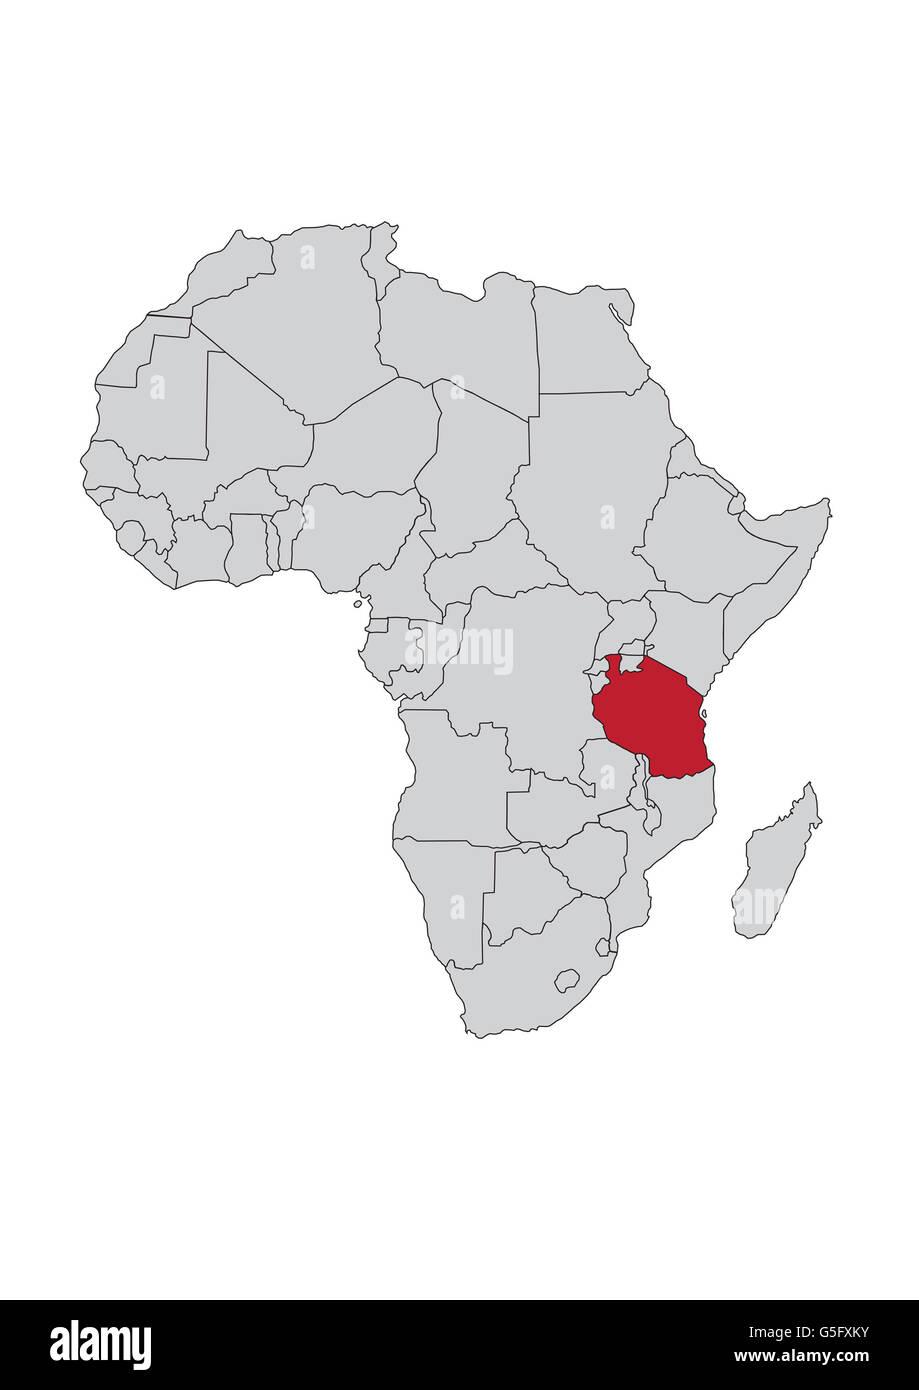 Map Of Africa Tanzania.Map Of Africa Tanzania Stock Photo 106685711 Alamy